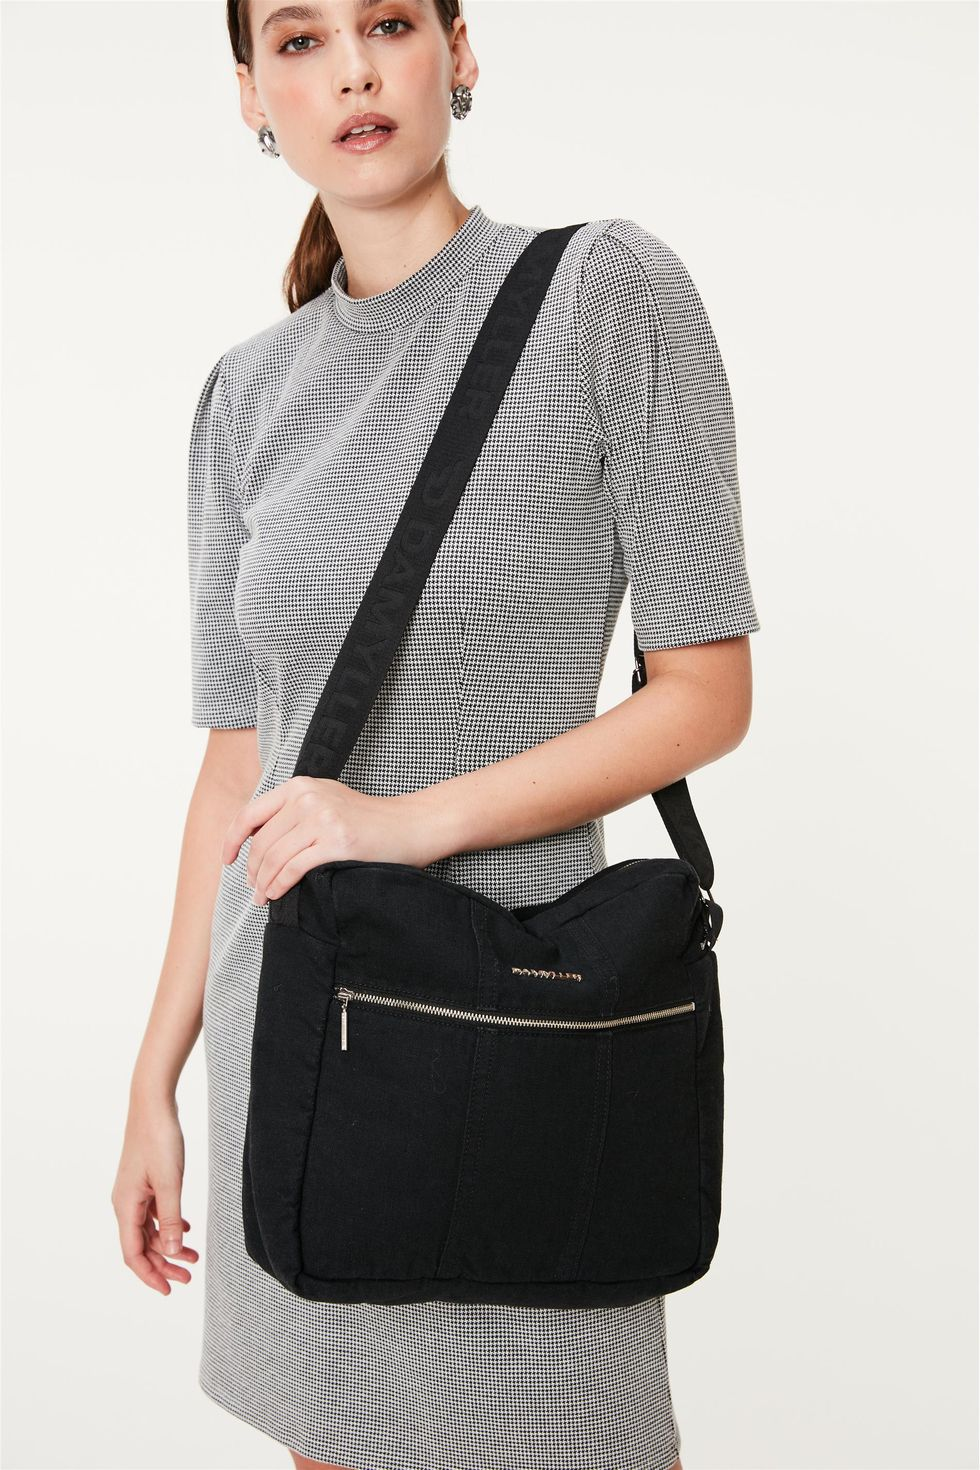 Bolsa-Jeans-Black-Unissex-Ecodamyller-Frente--